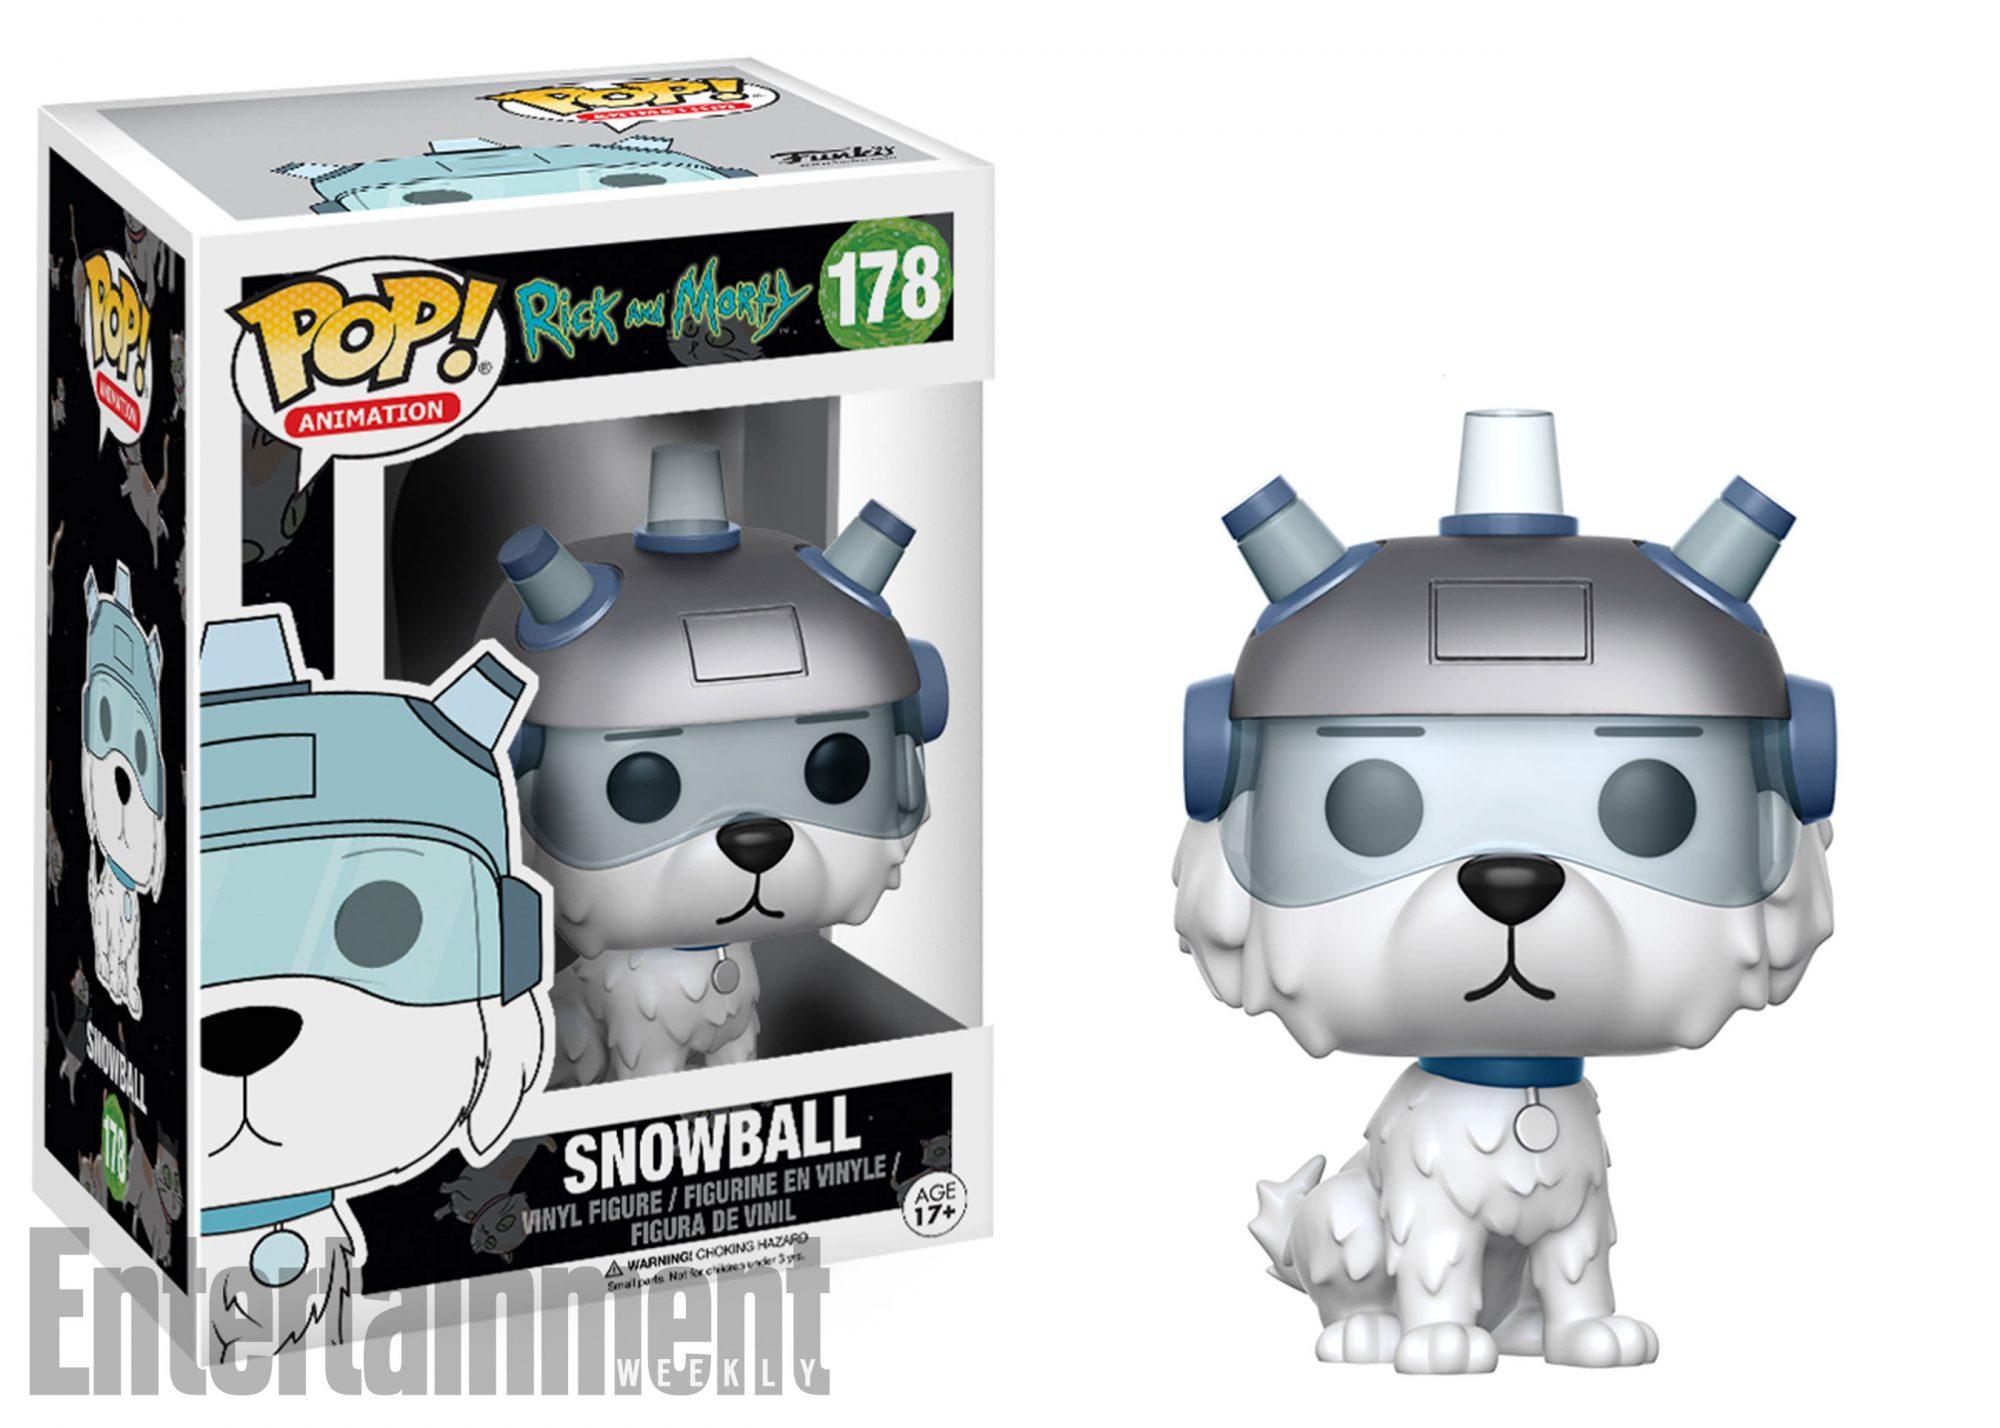 12445_rickmorty_snowball_glam_hires